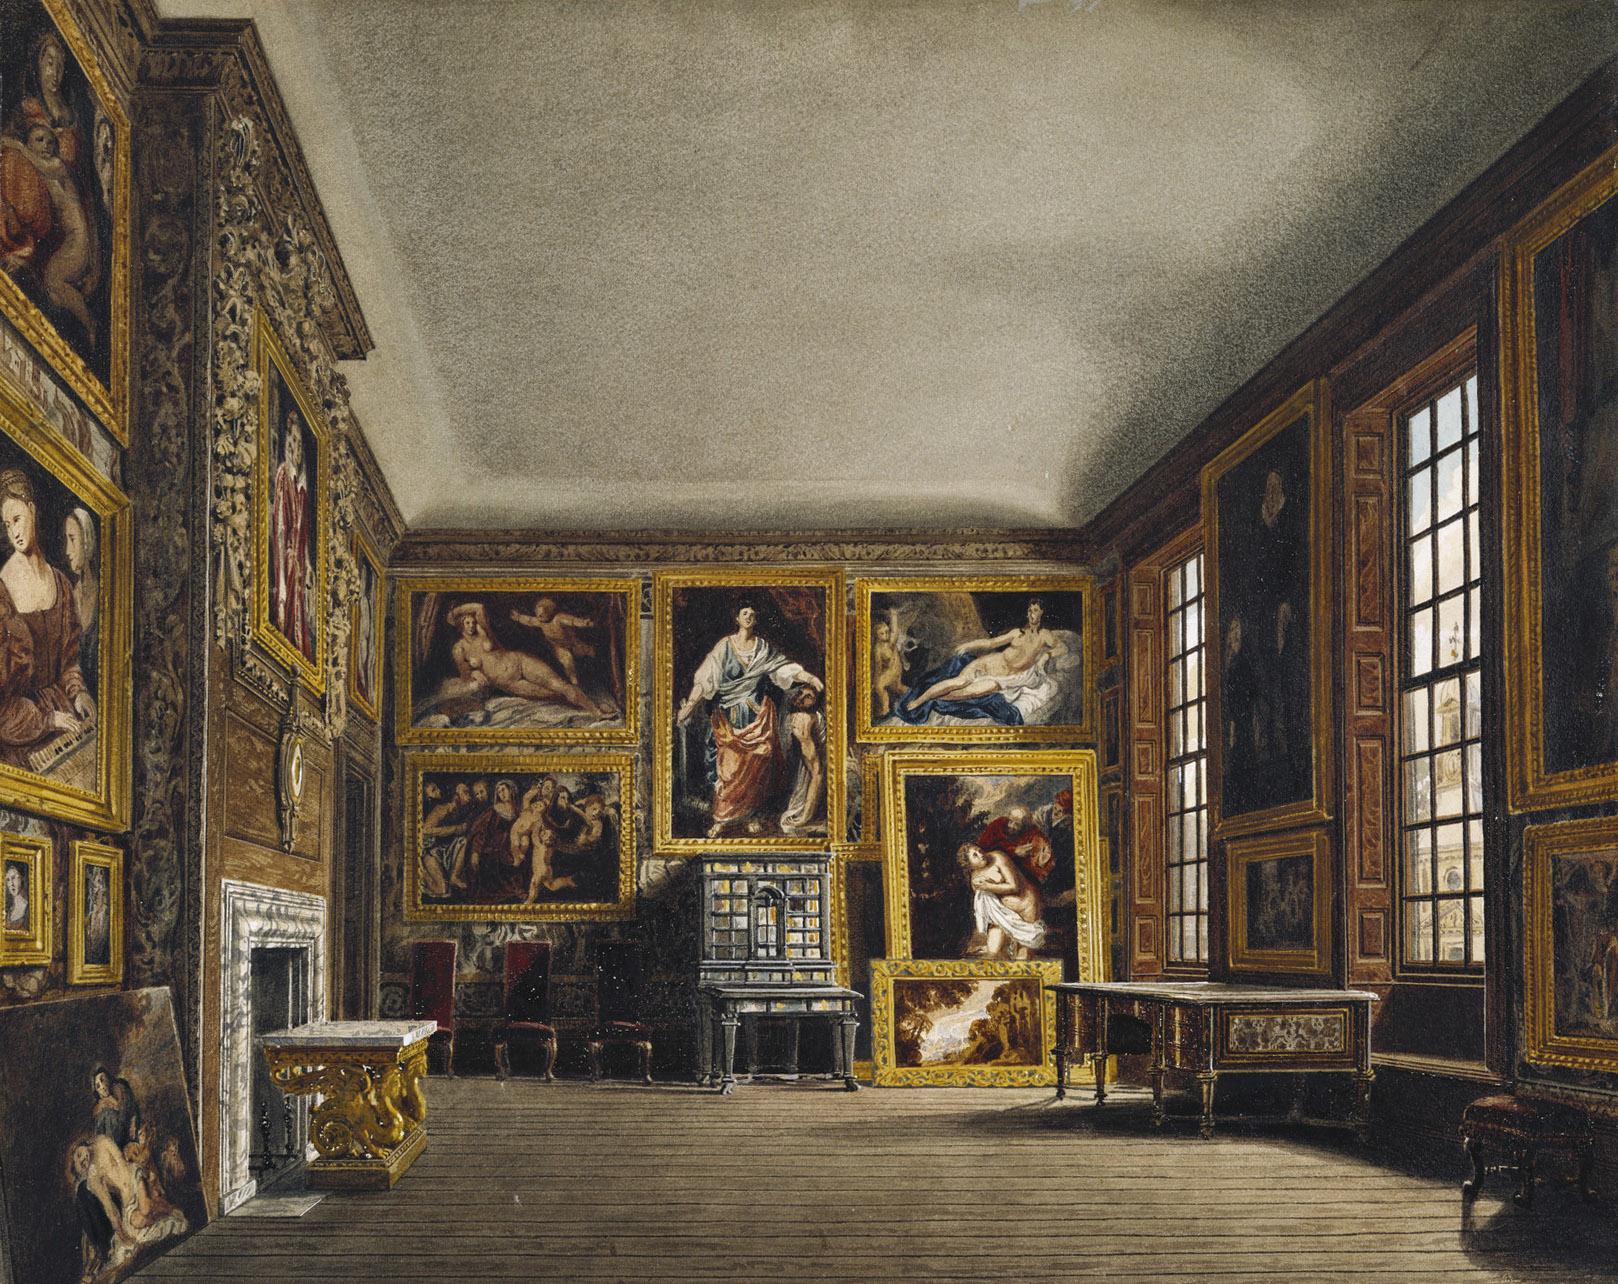 Kensington Palace C Queen S Bedchamber C By Richard Cattermole C Royal Coll Ori on Kensington Palace London